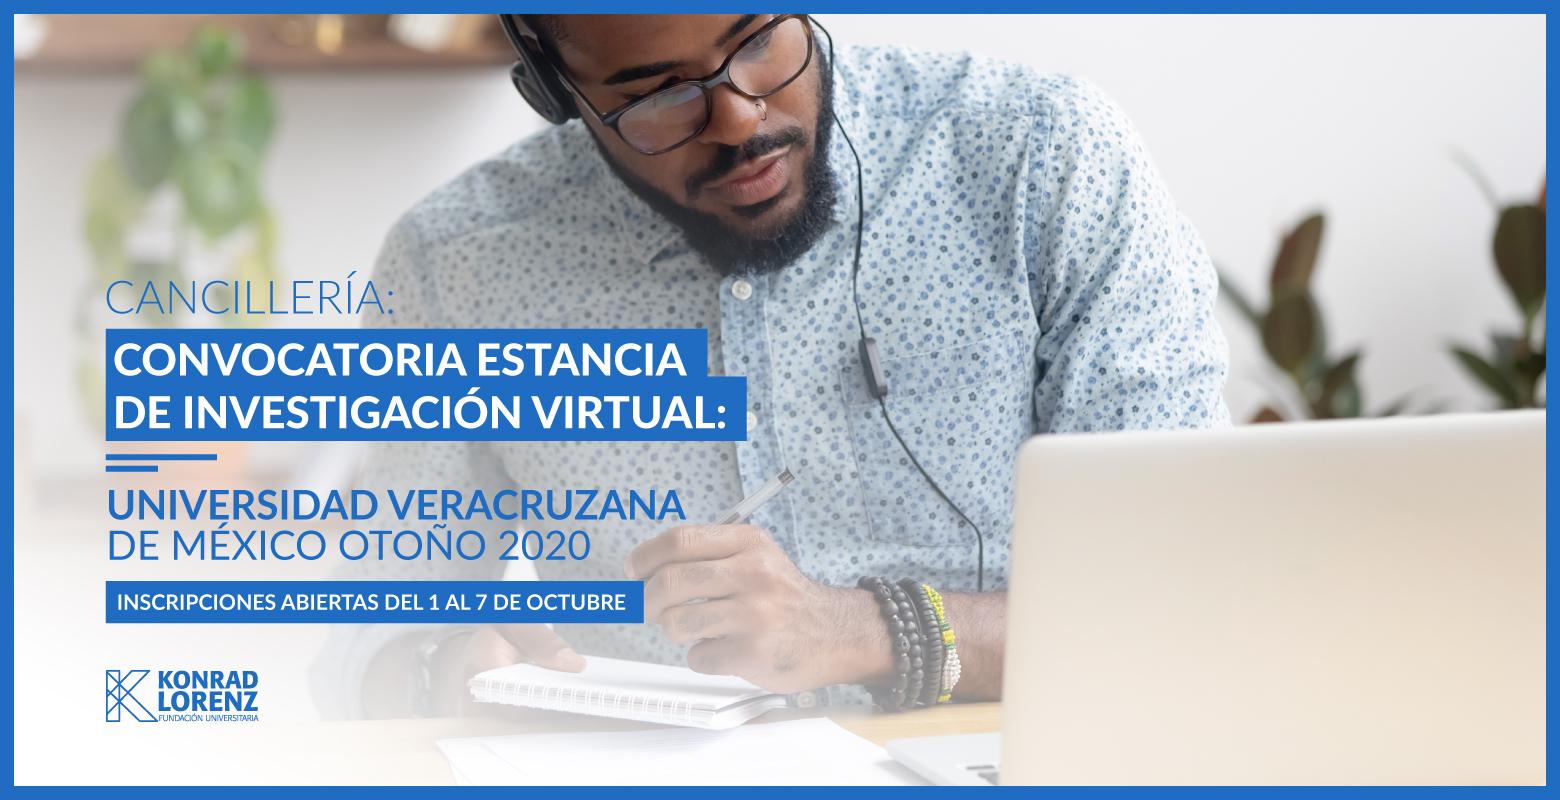 Convocatoria Estancia de Investigación Virtual: Universidad Veracruzana de México Otoño 2020